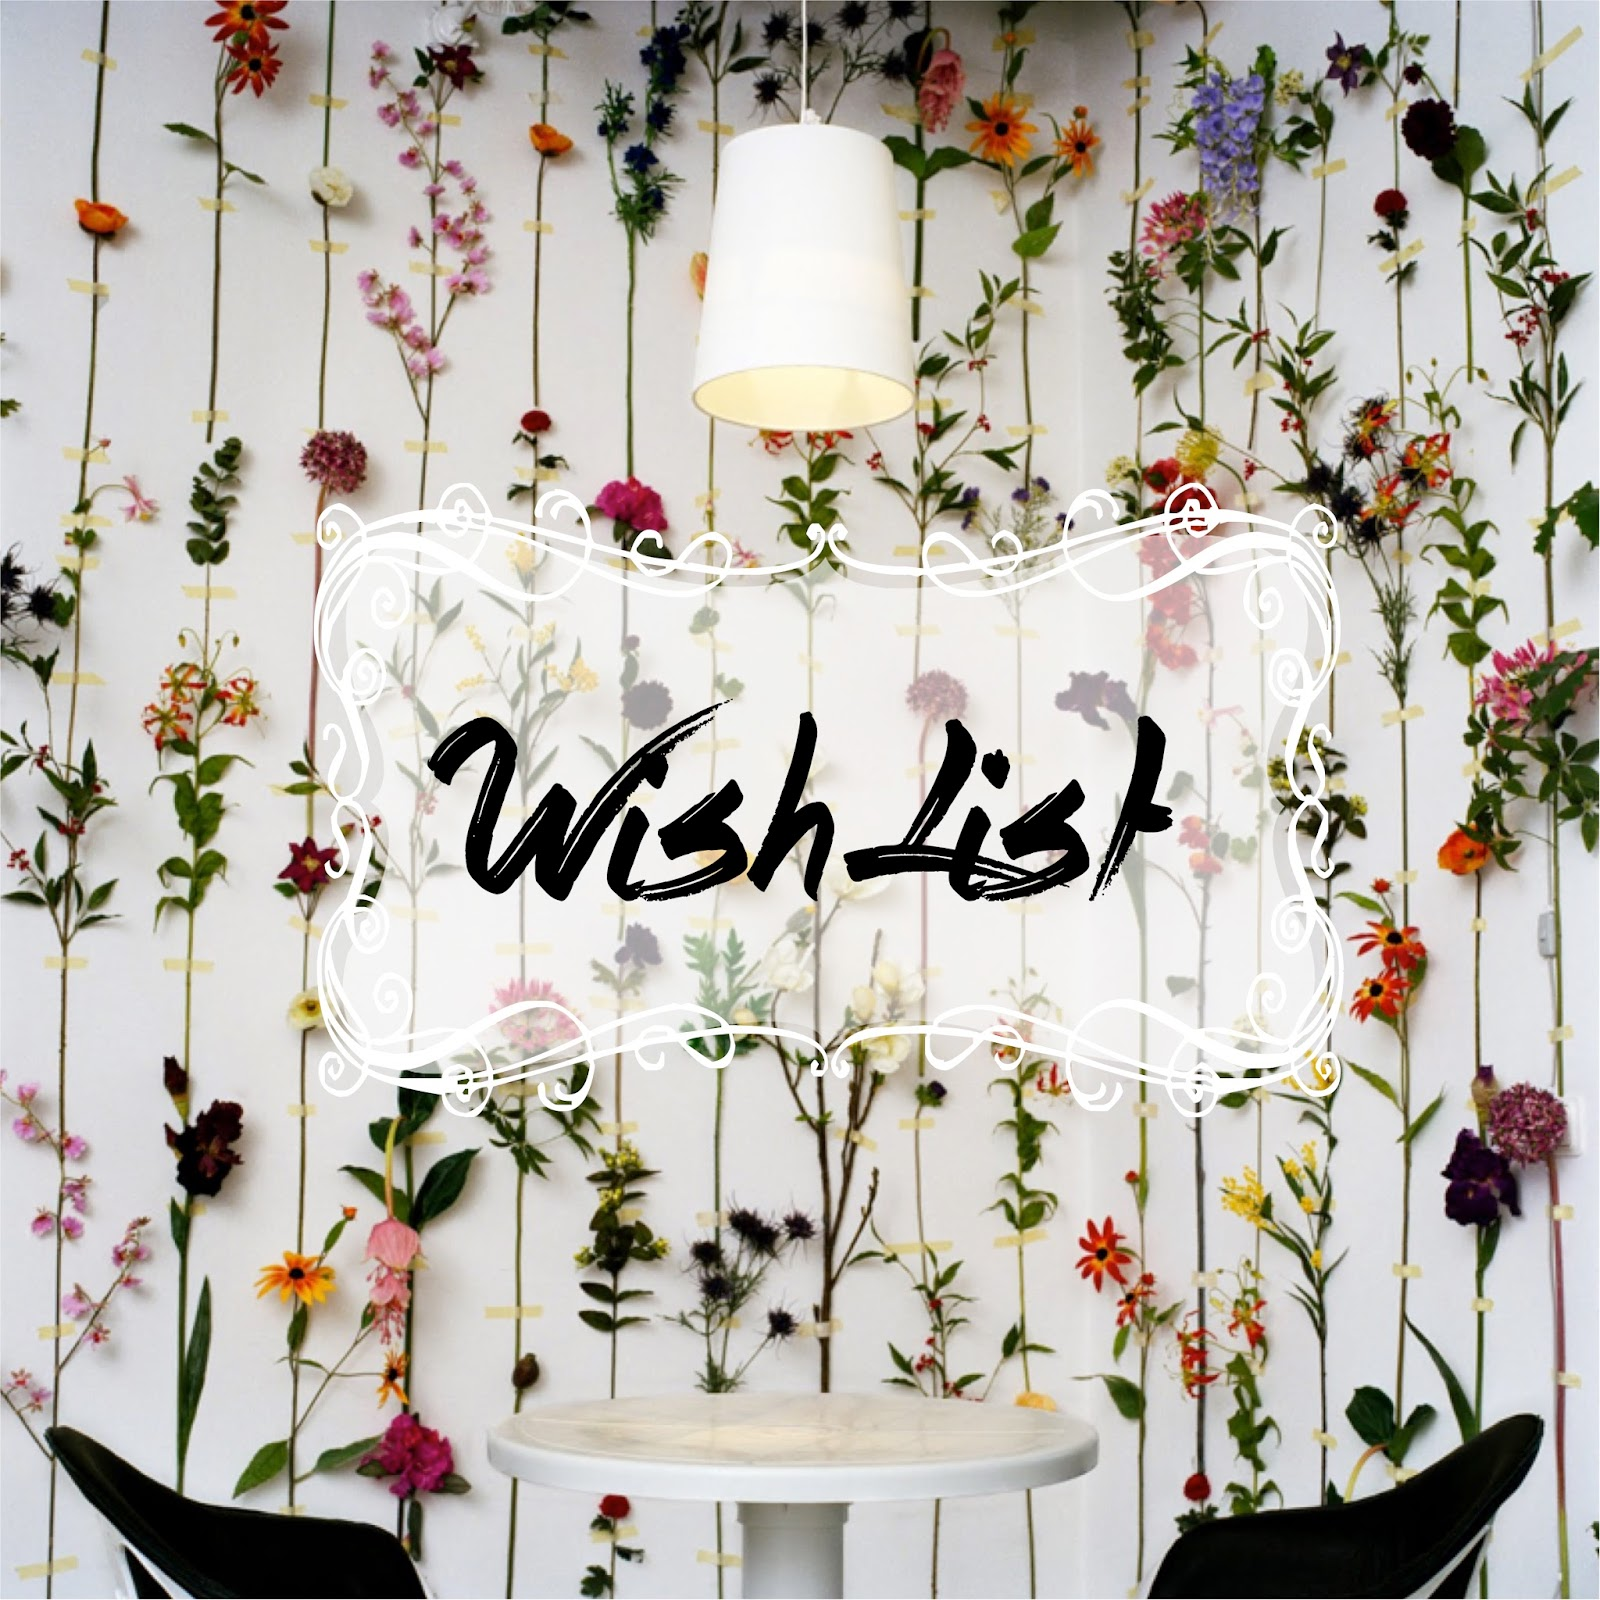 wishlist Banggood